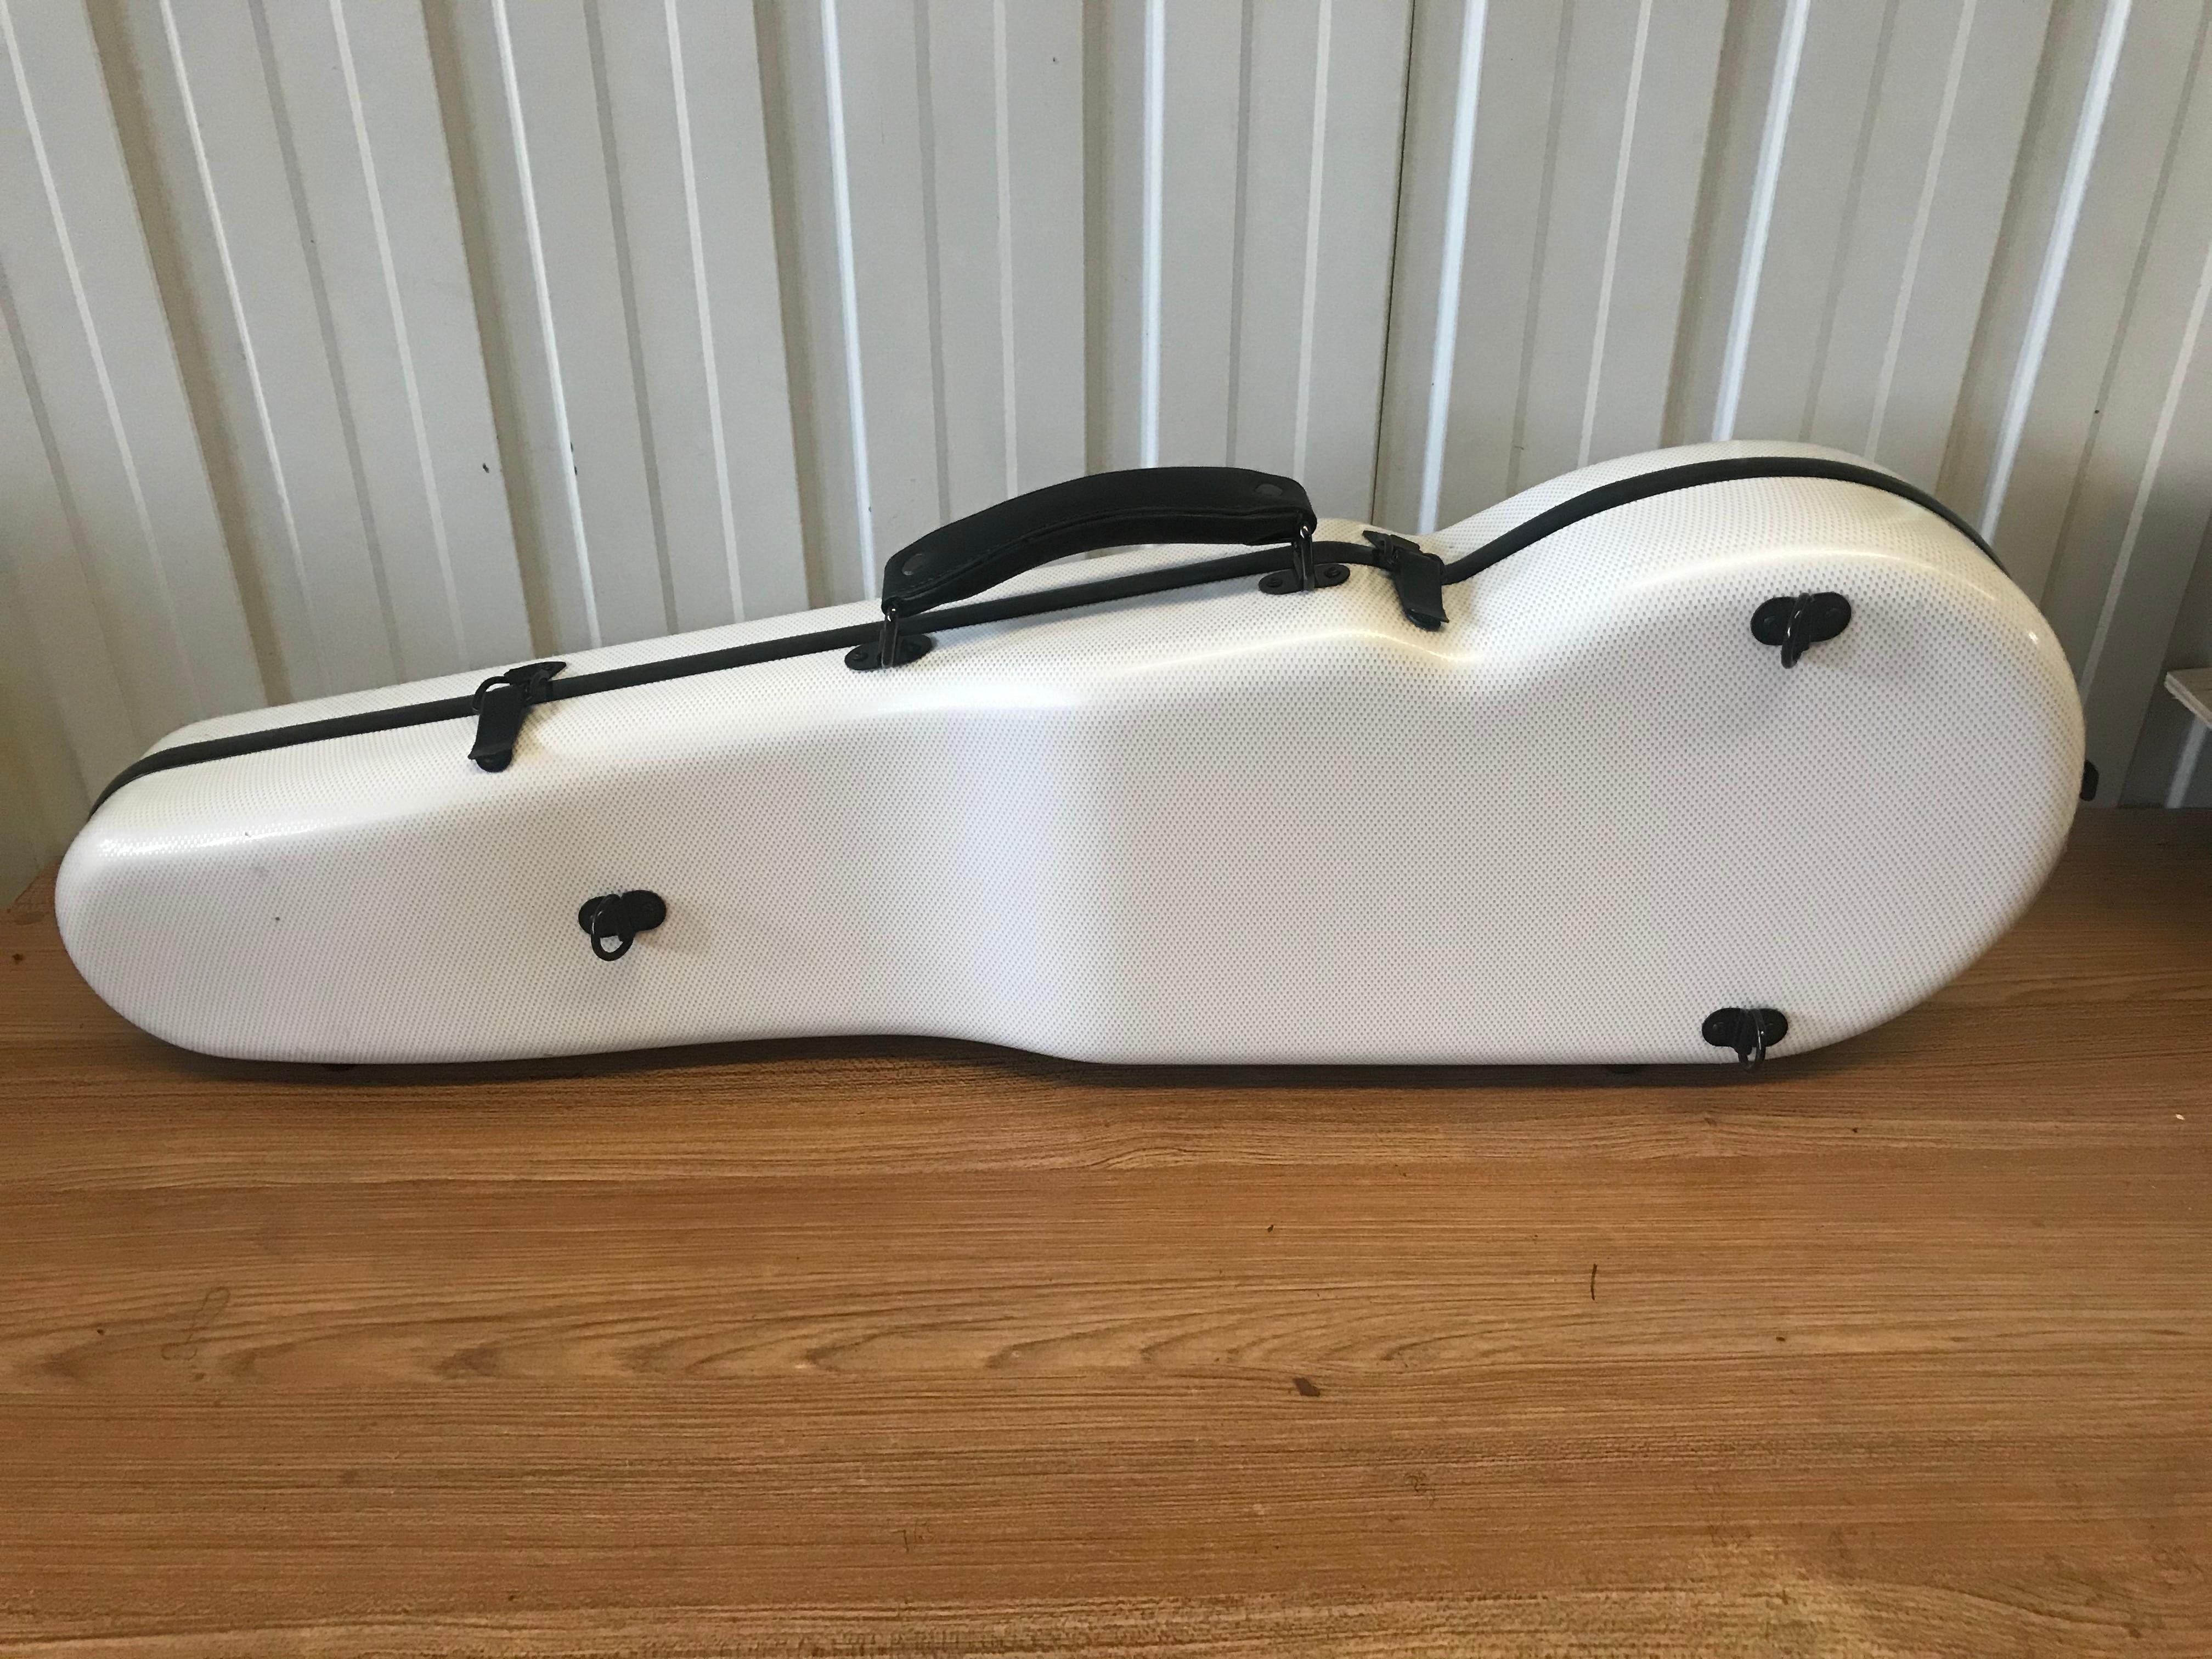 High Quality 4/4 Violin Carbon Fiber Box Hard Violin Case Triangle Light Music Instrument Free Shipping enlarge